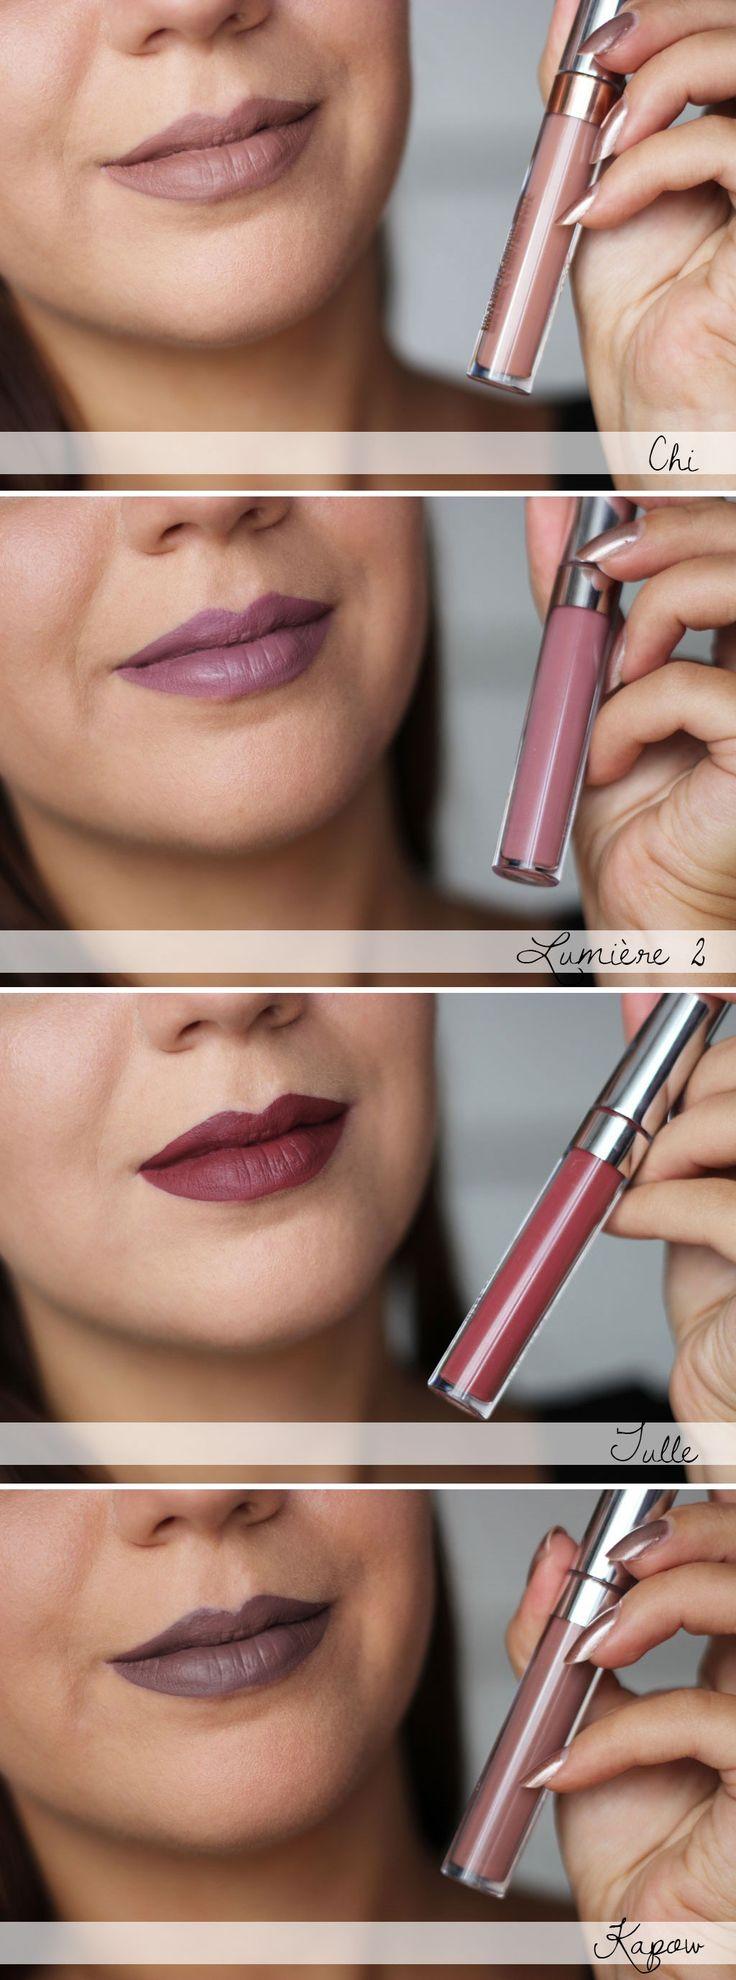 ColourPop Ultra Matte Lips Swatches - Kapow, Chi, Lumière 2, Tulle